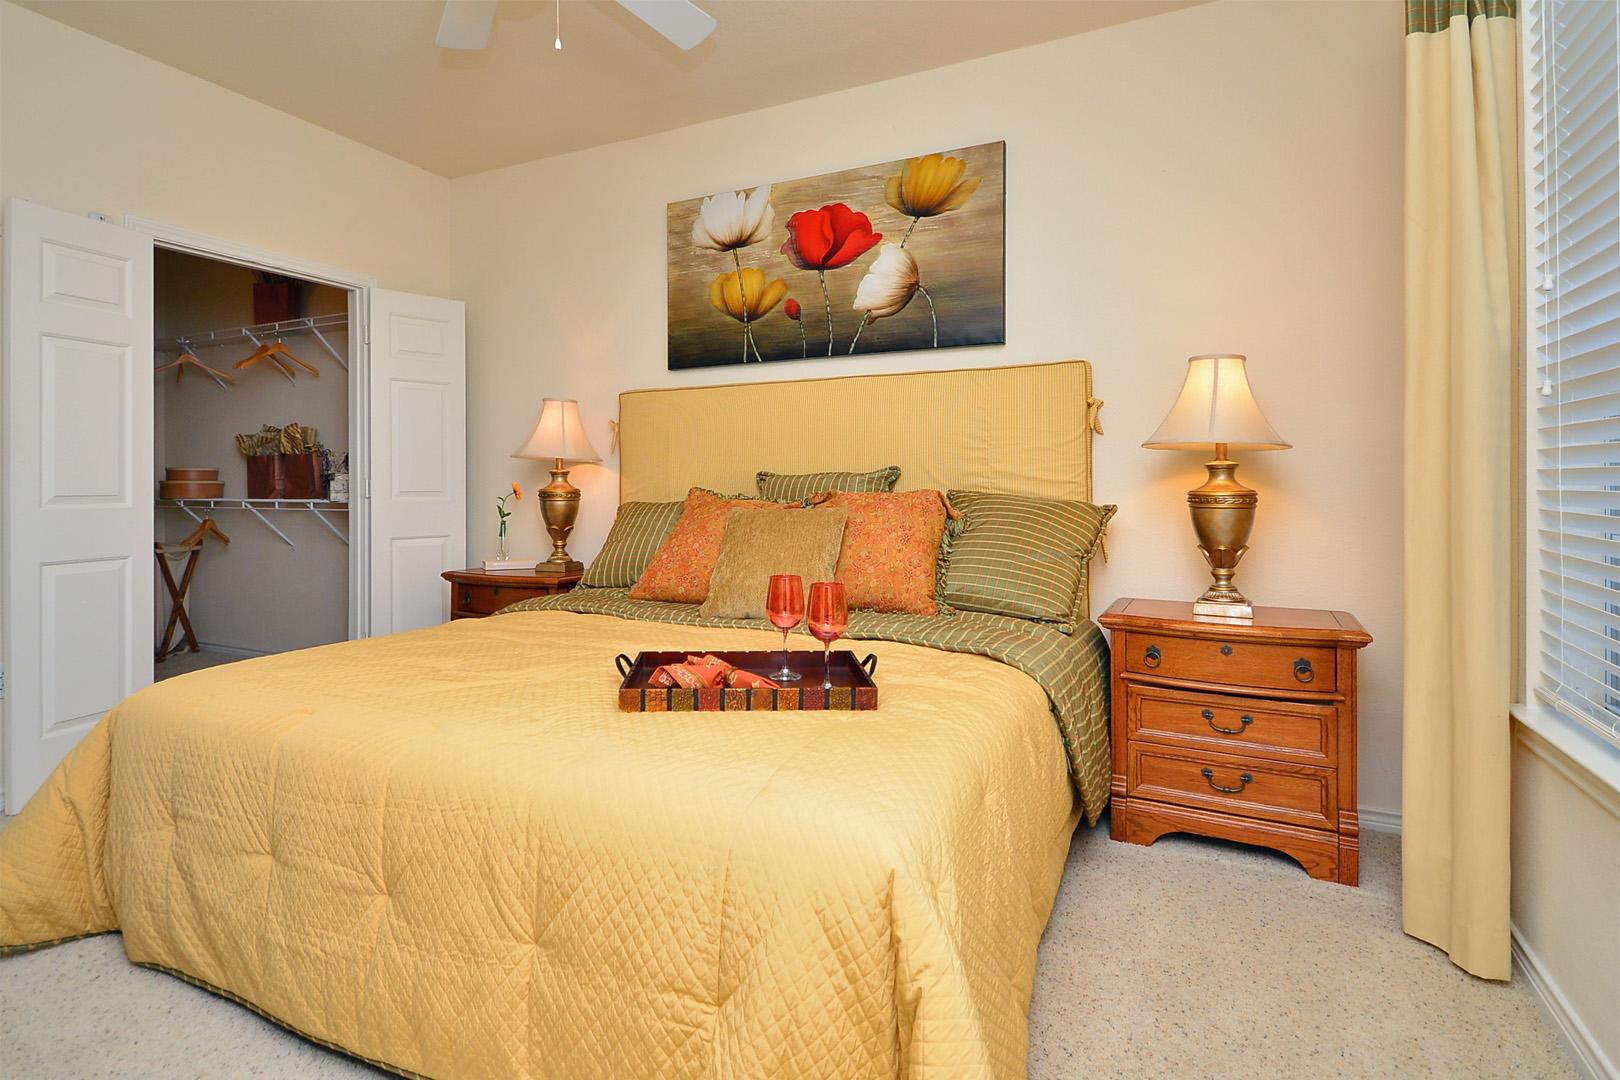 The Lakes at Cinco Ranch Apartments in Katy, TX image 24